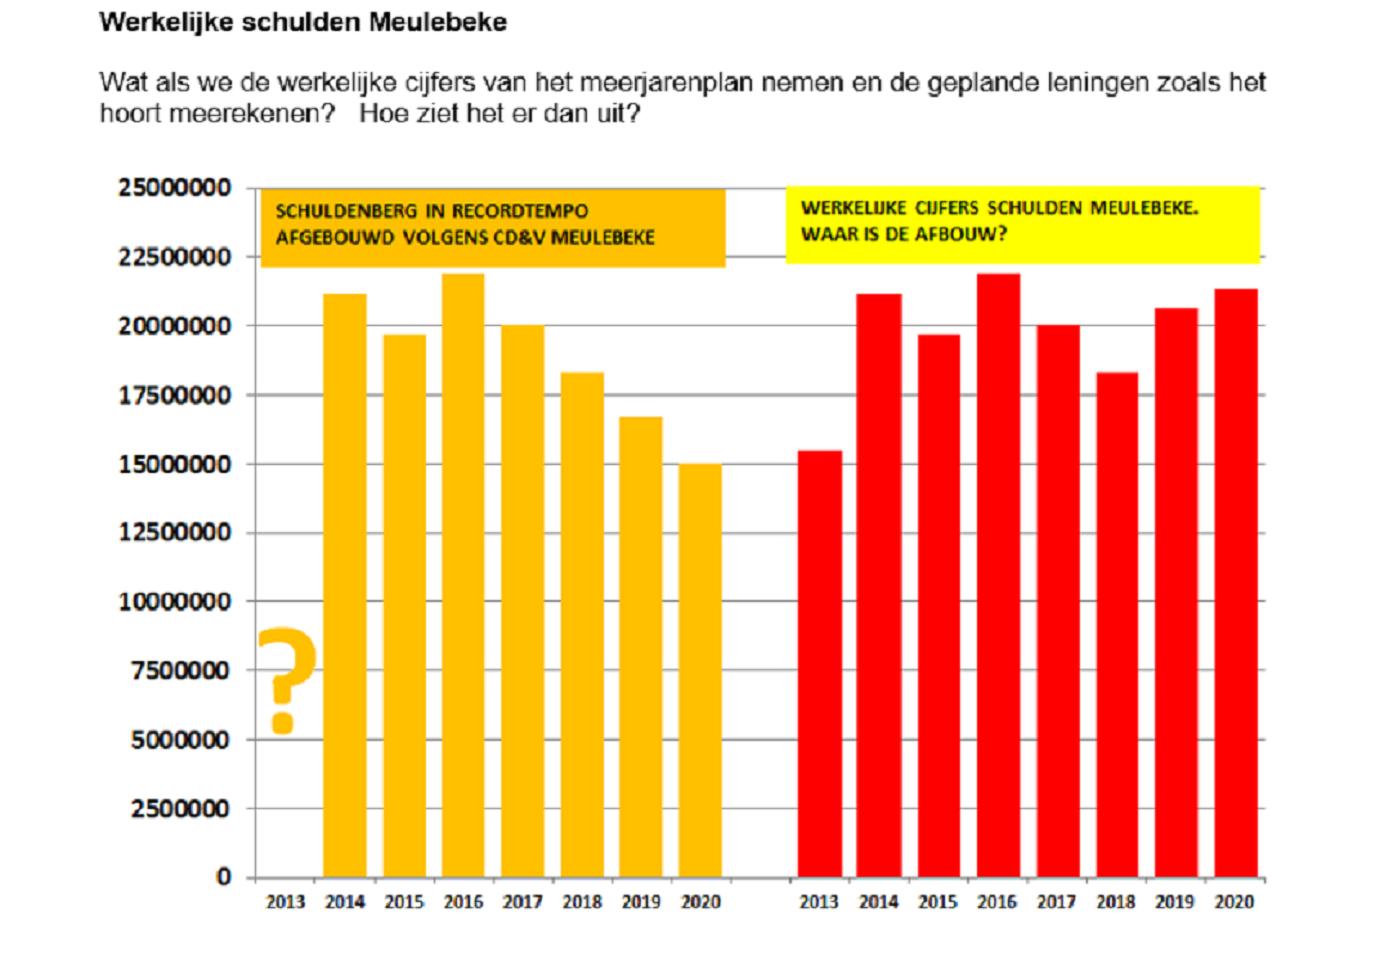 CD&V Meulebeke liegt over schuldenberg Meulebeke